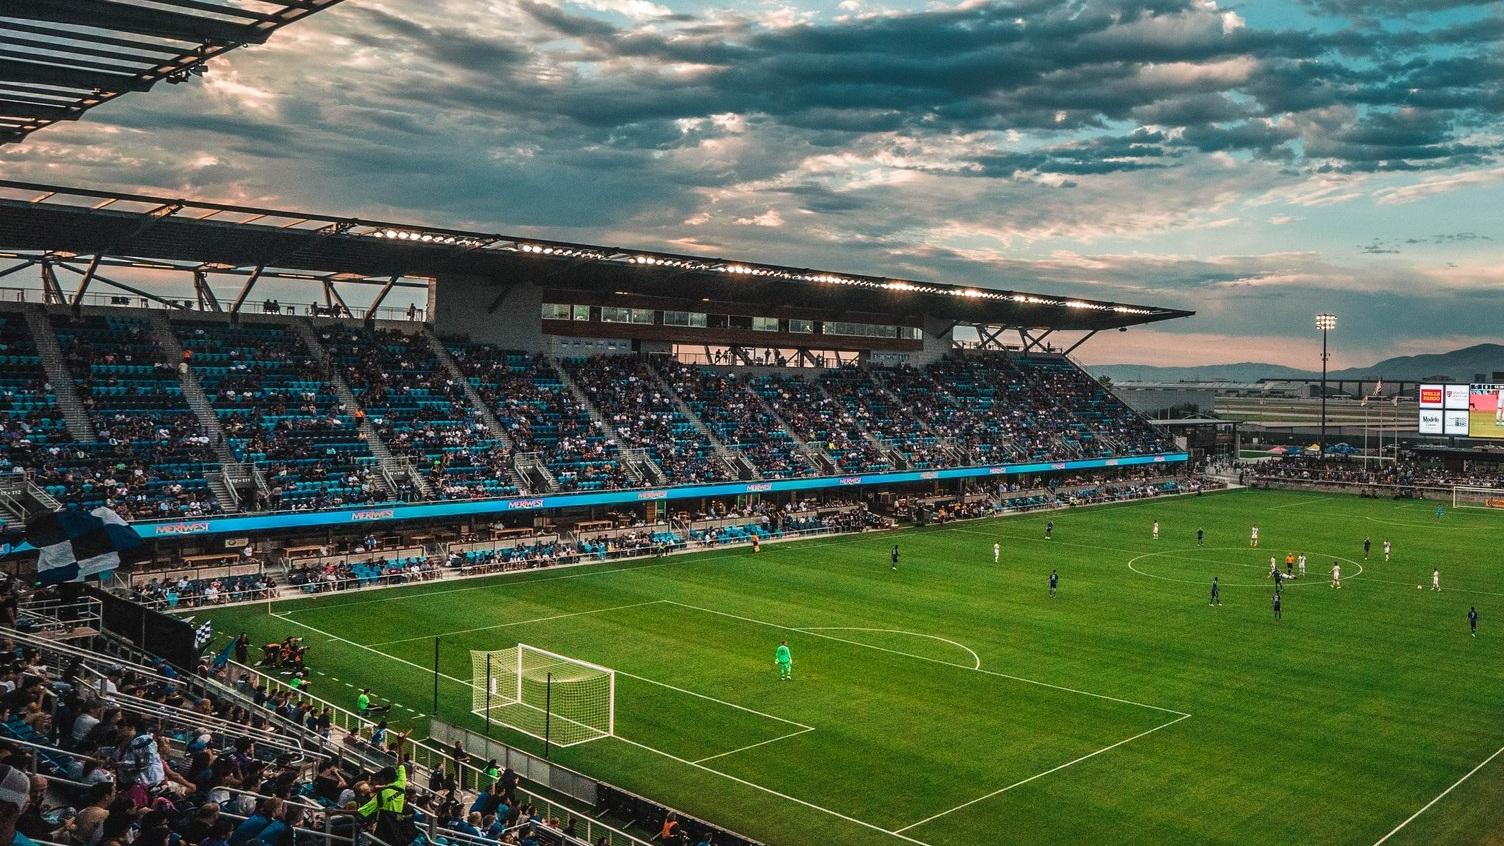 joseph-barrientos-685862-unsplash Avaya Stadium San Jose.jpg